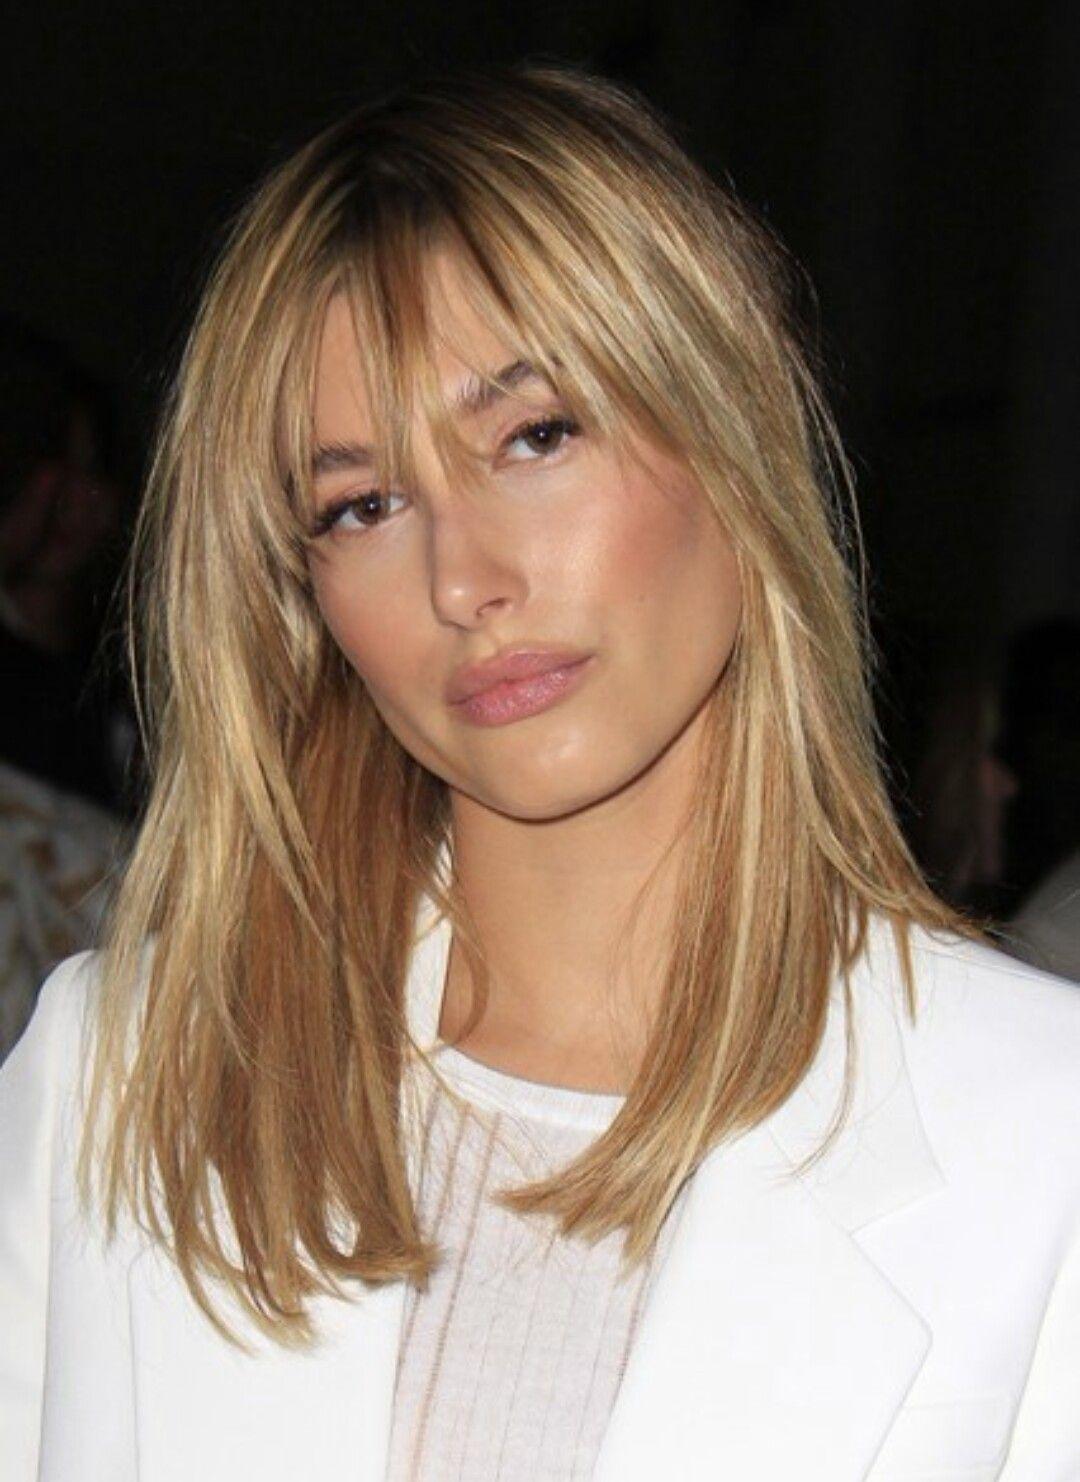 Bangs Blonde Hairstyle Hair Makeup Pinterest Hair Hair